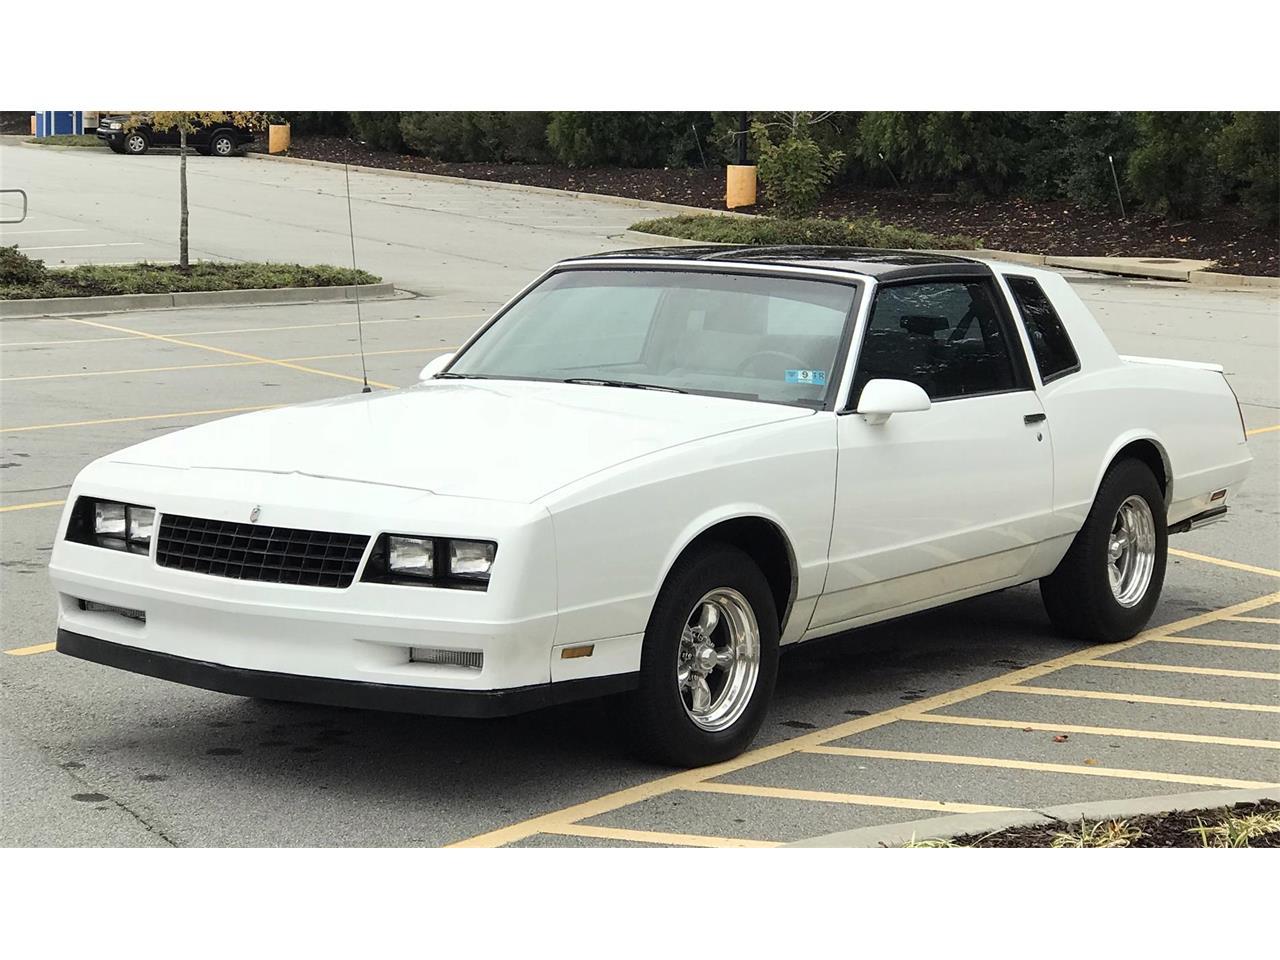 Ss Monte Carlo >> 1988 Chevrolet Monte Carlo Ss For Sale Classiccars Com Cc 1040946